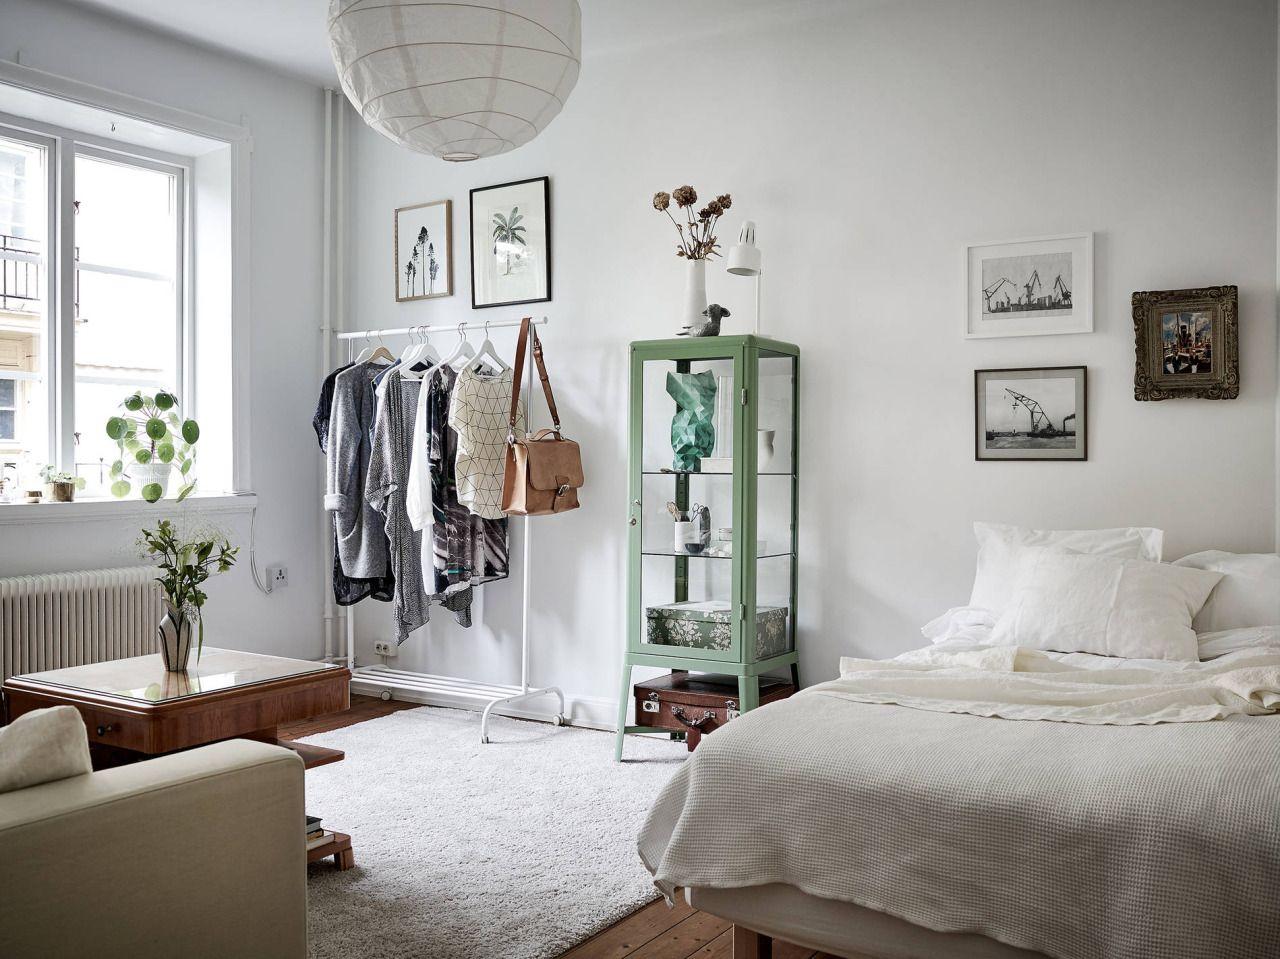 Gravity Home Studio Apartment With Vintage Touch Follow Studio Apartment Decorating Apartment Bedroom Decor Apartment Decor